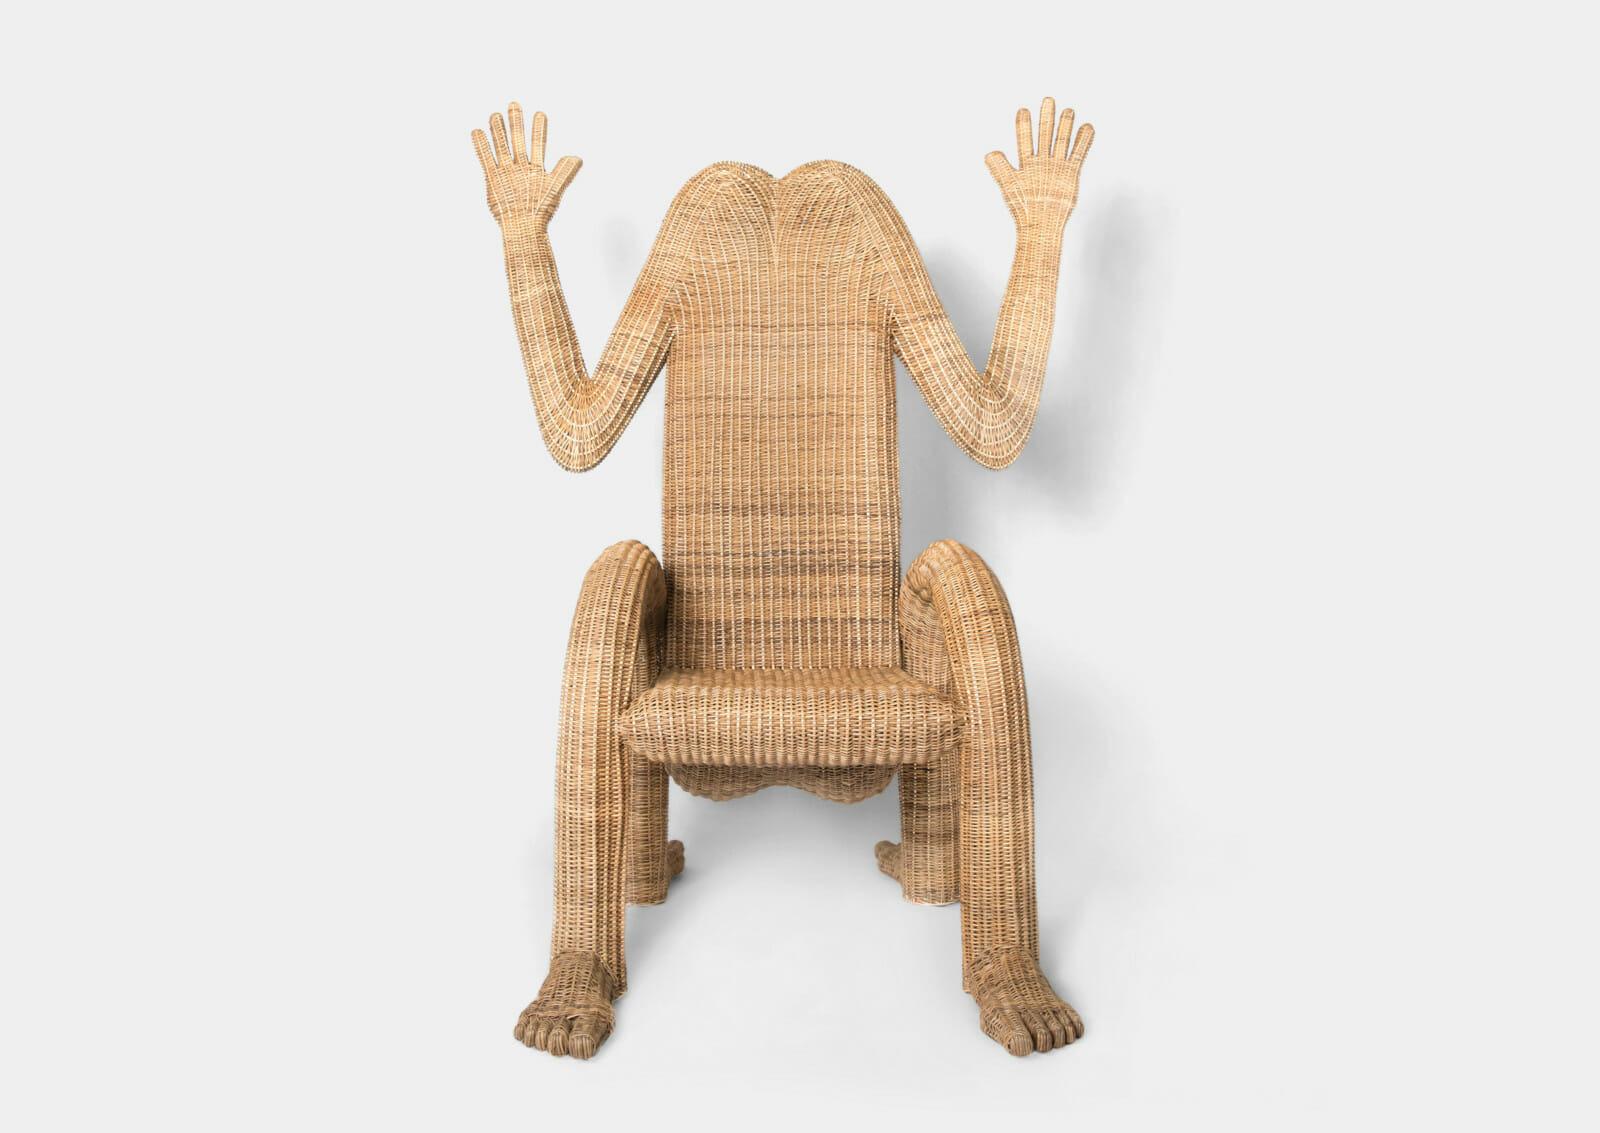 Nalgona Chair